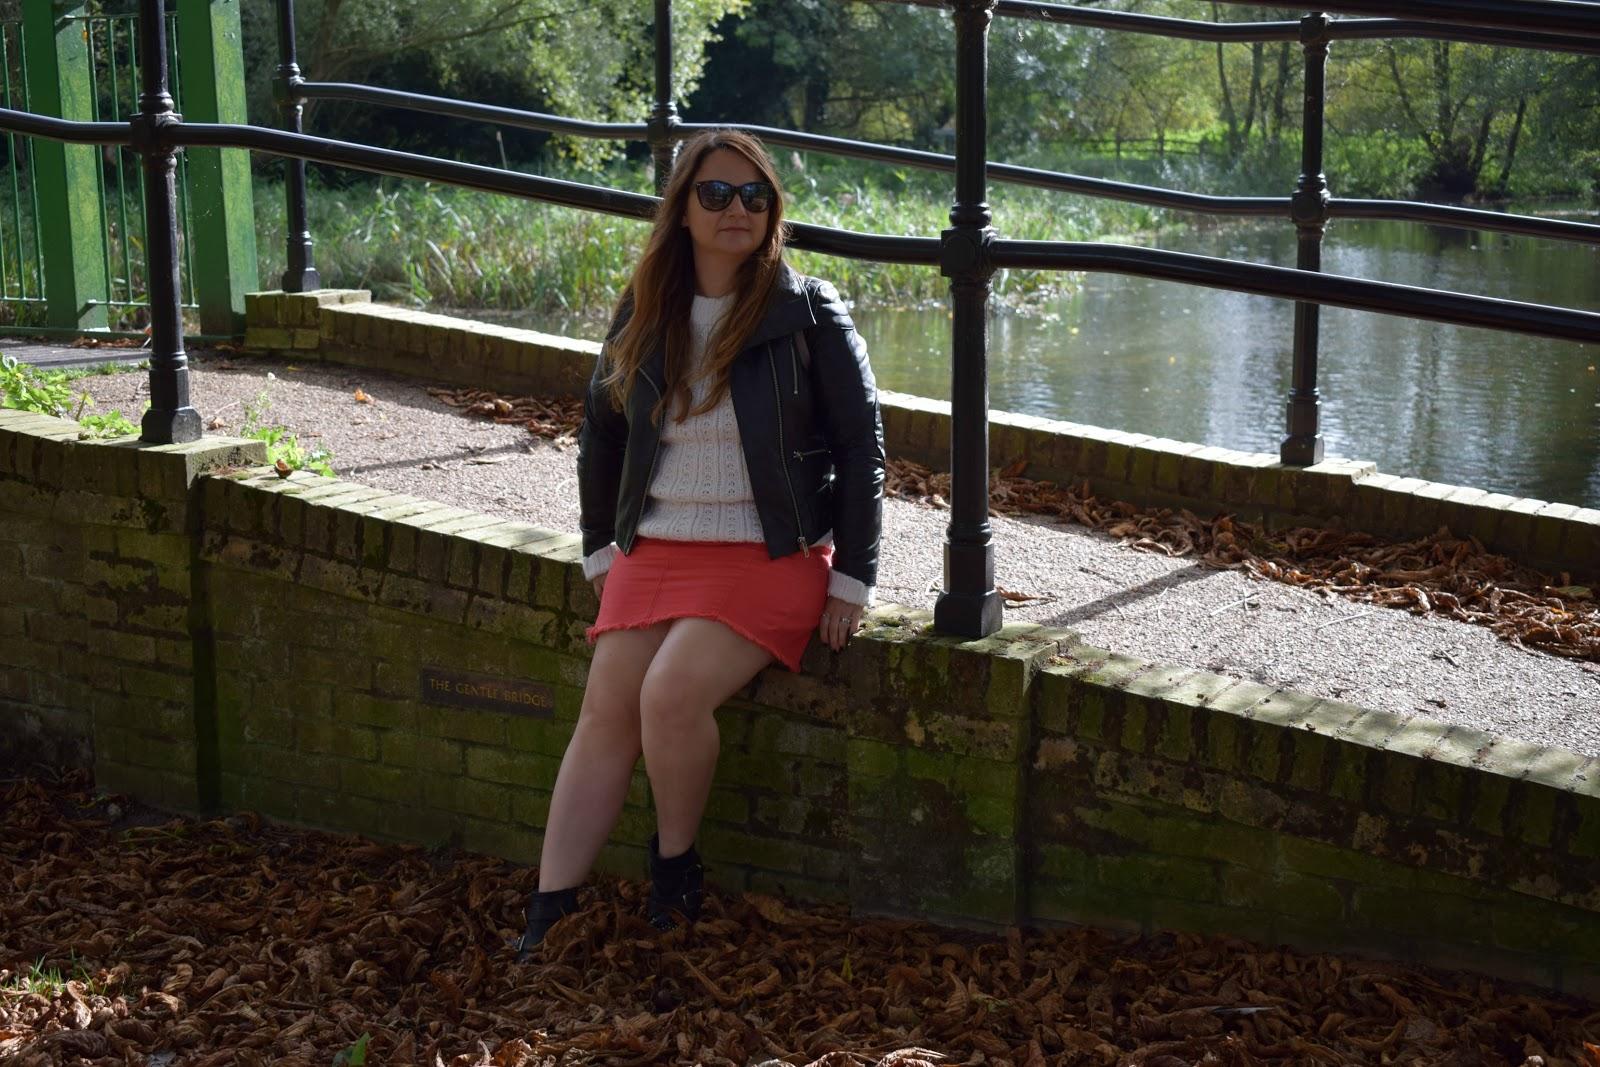 styling a denim skirt for autumn